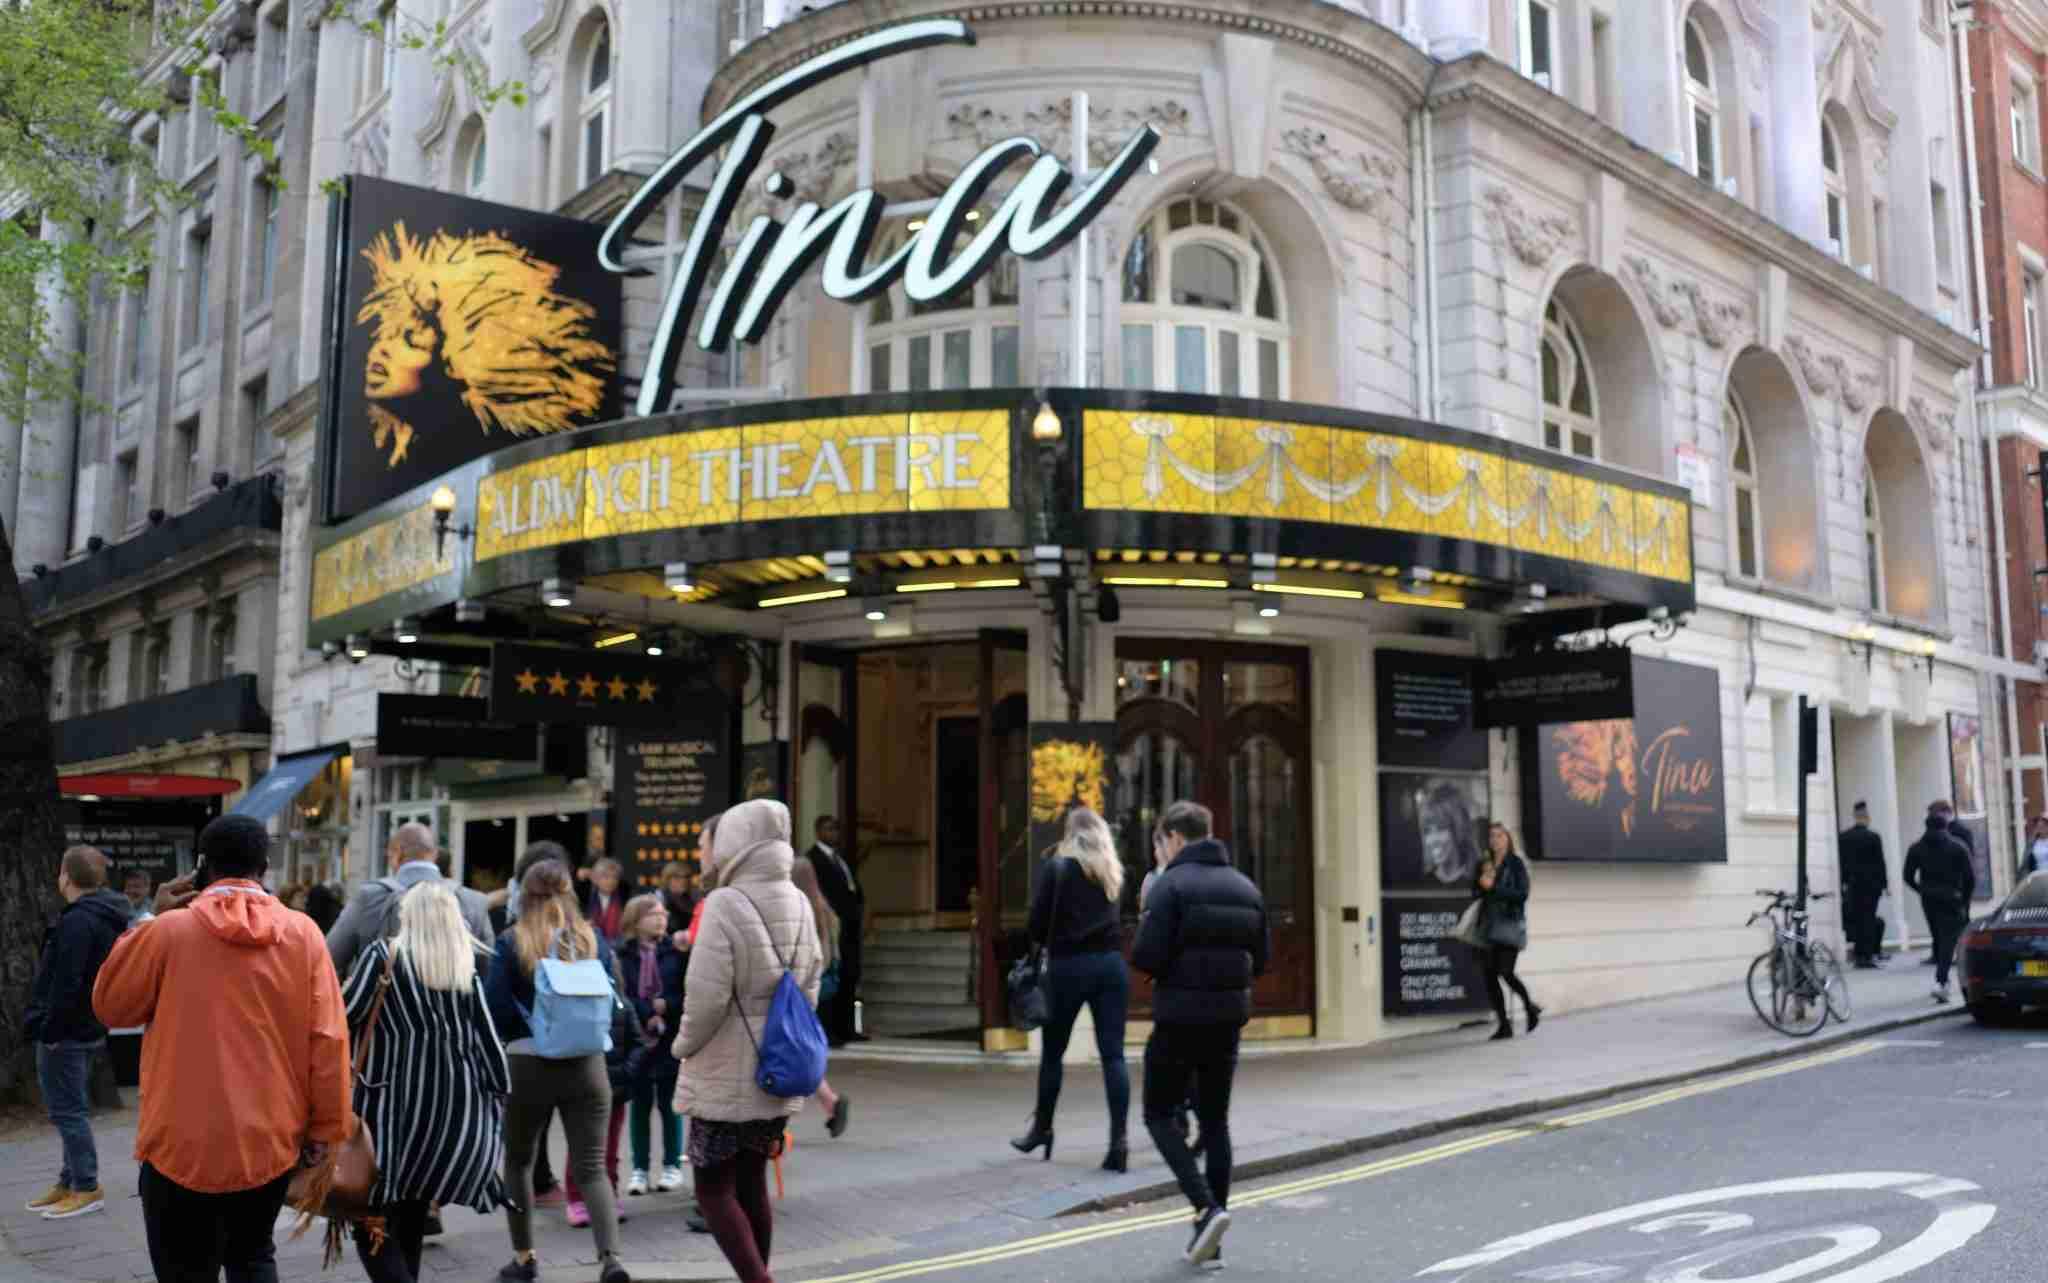 Aldwych-Theatre-Box-Office-London